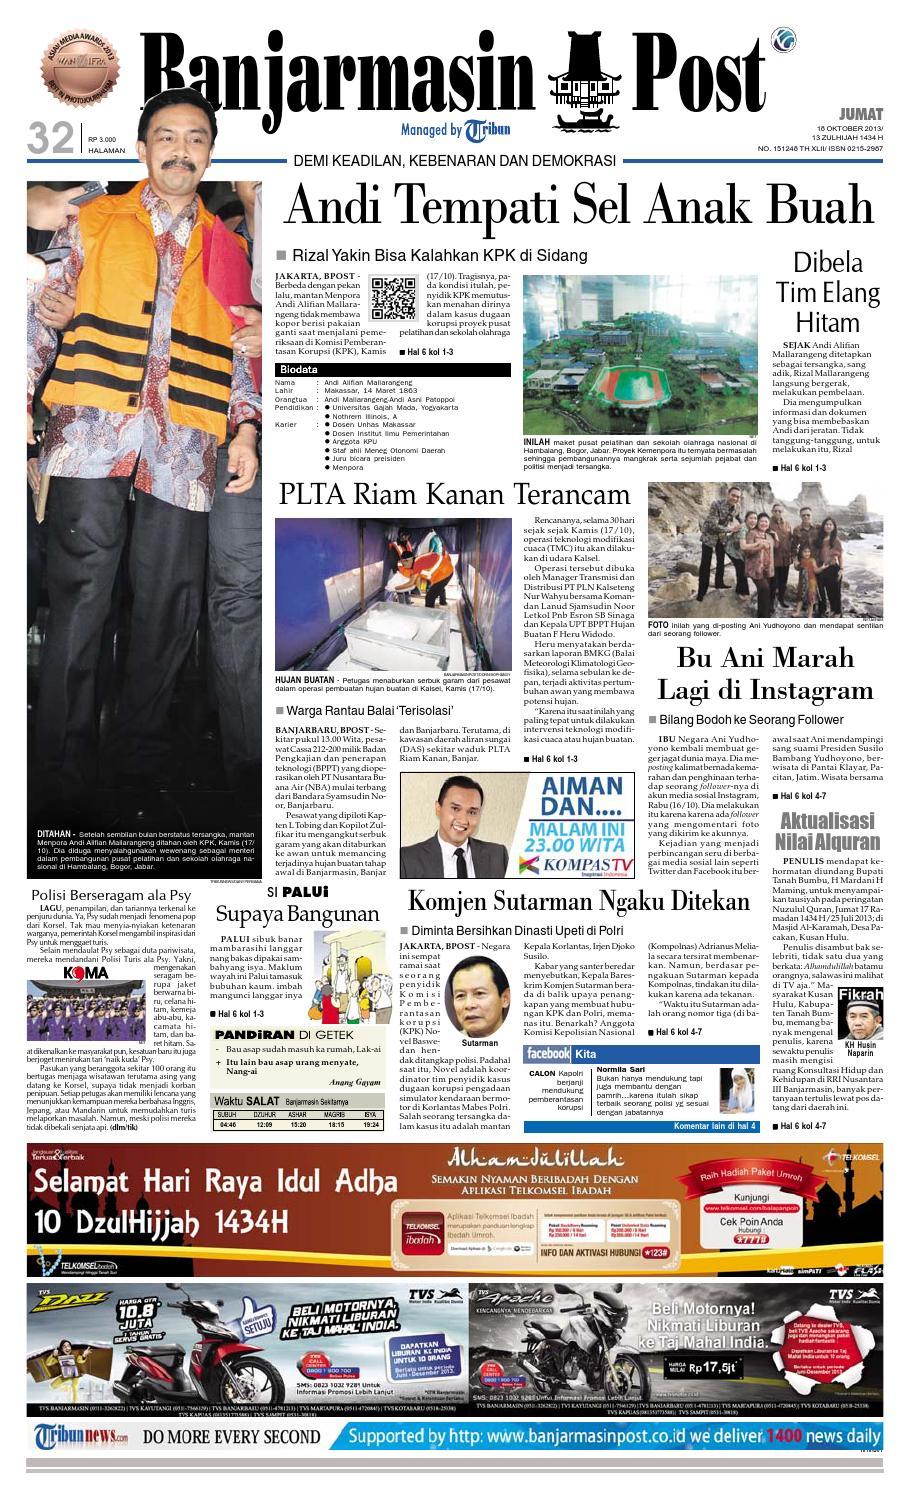 Banjarmasin Post Jumat 18 Oktober 2013 By Issuu Charger Warna Warni Merk Hasan Sj0048